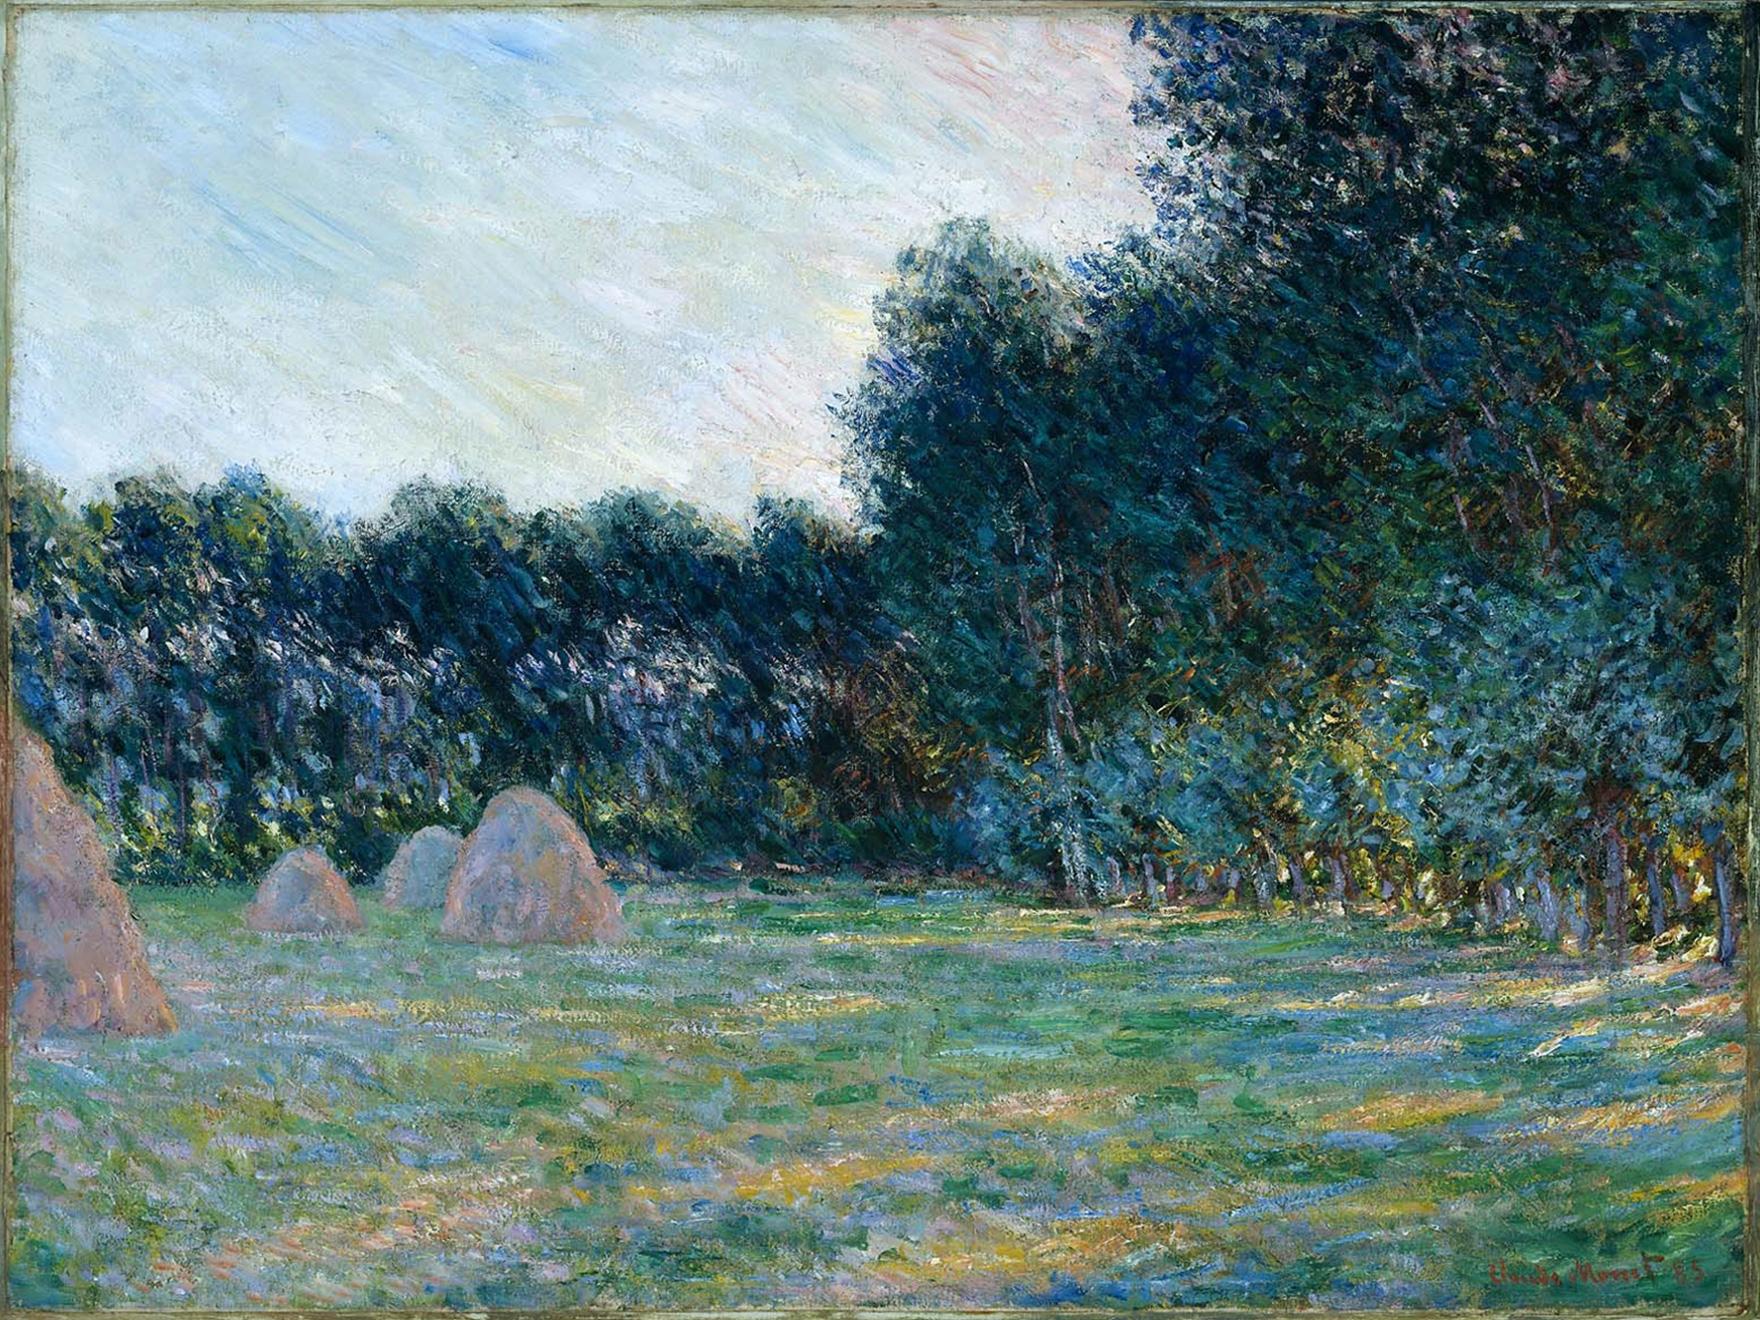 Claude Monet, Meadow with Haystacks near Giverny, 1885